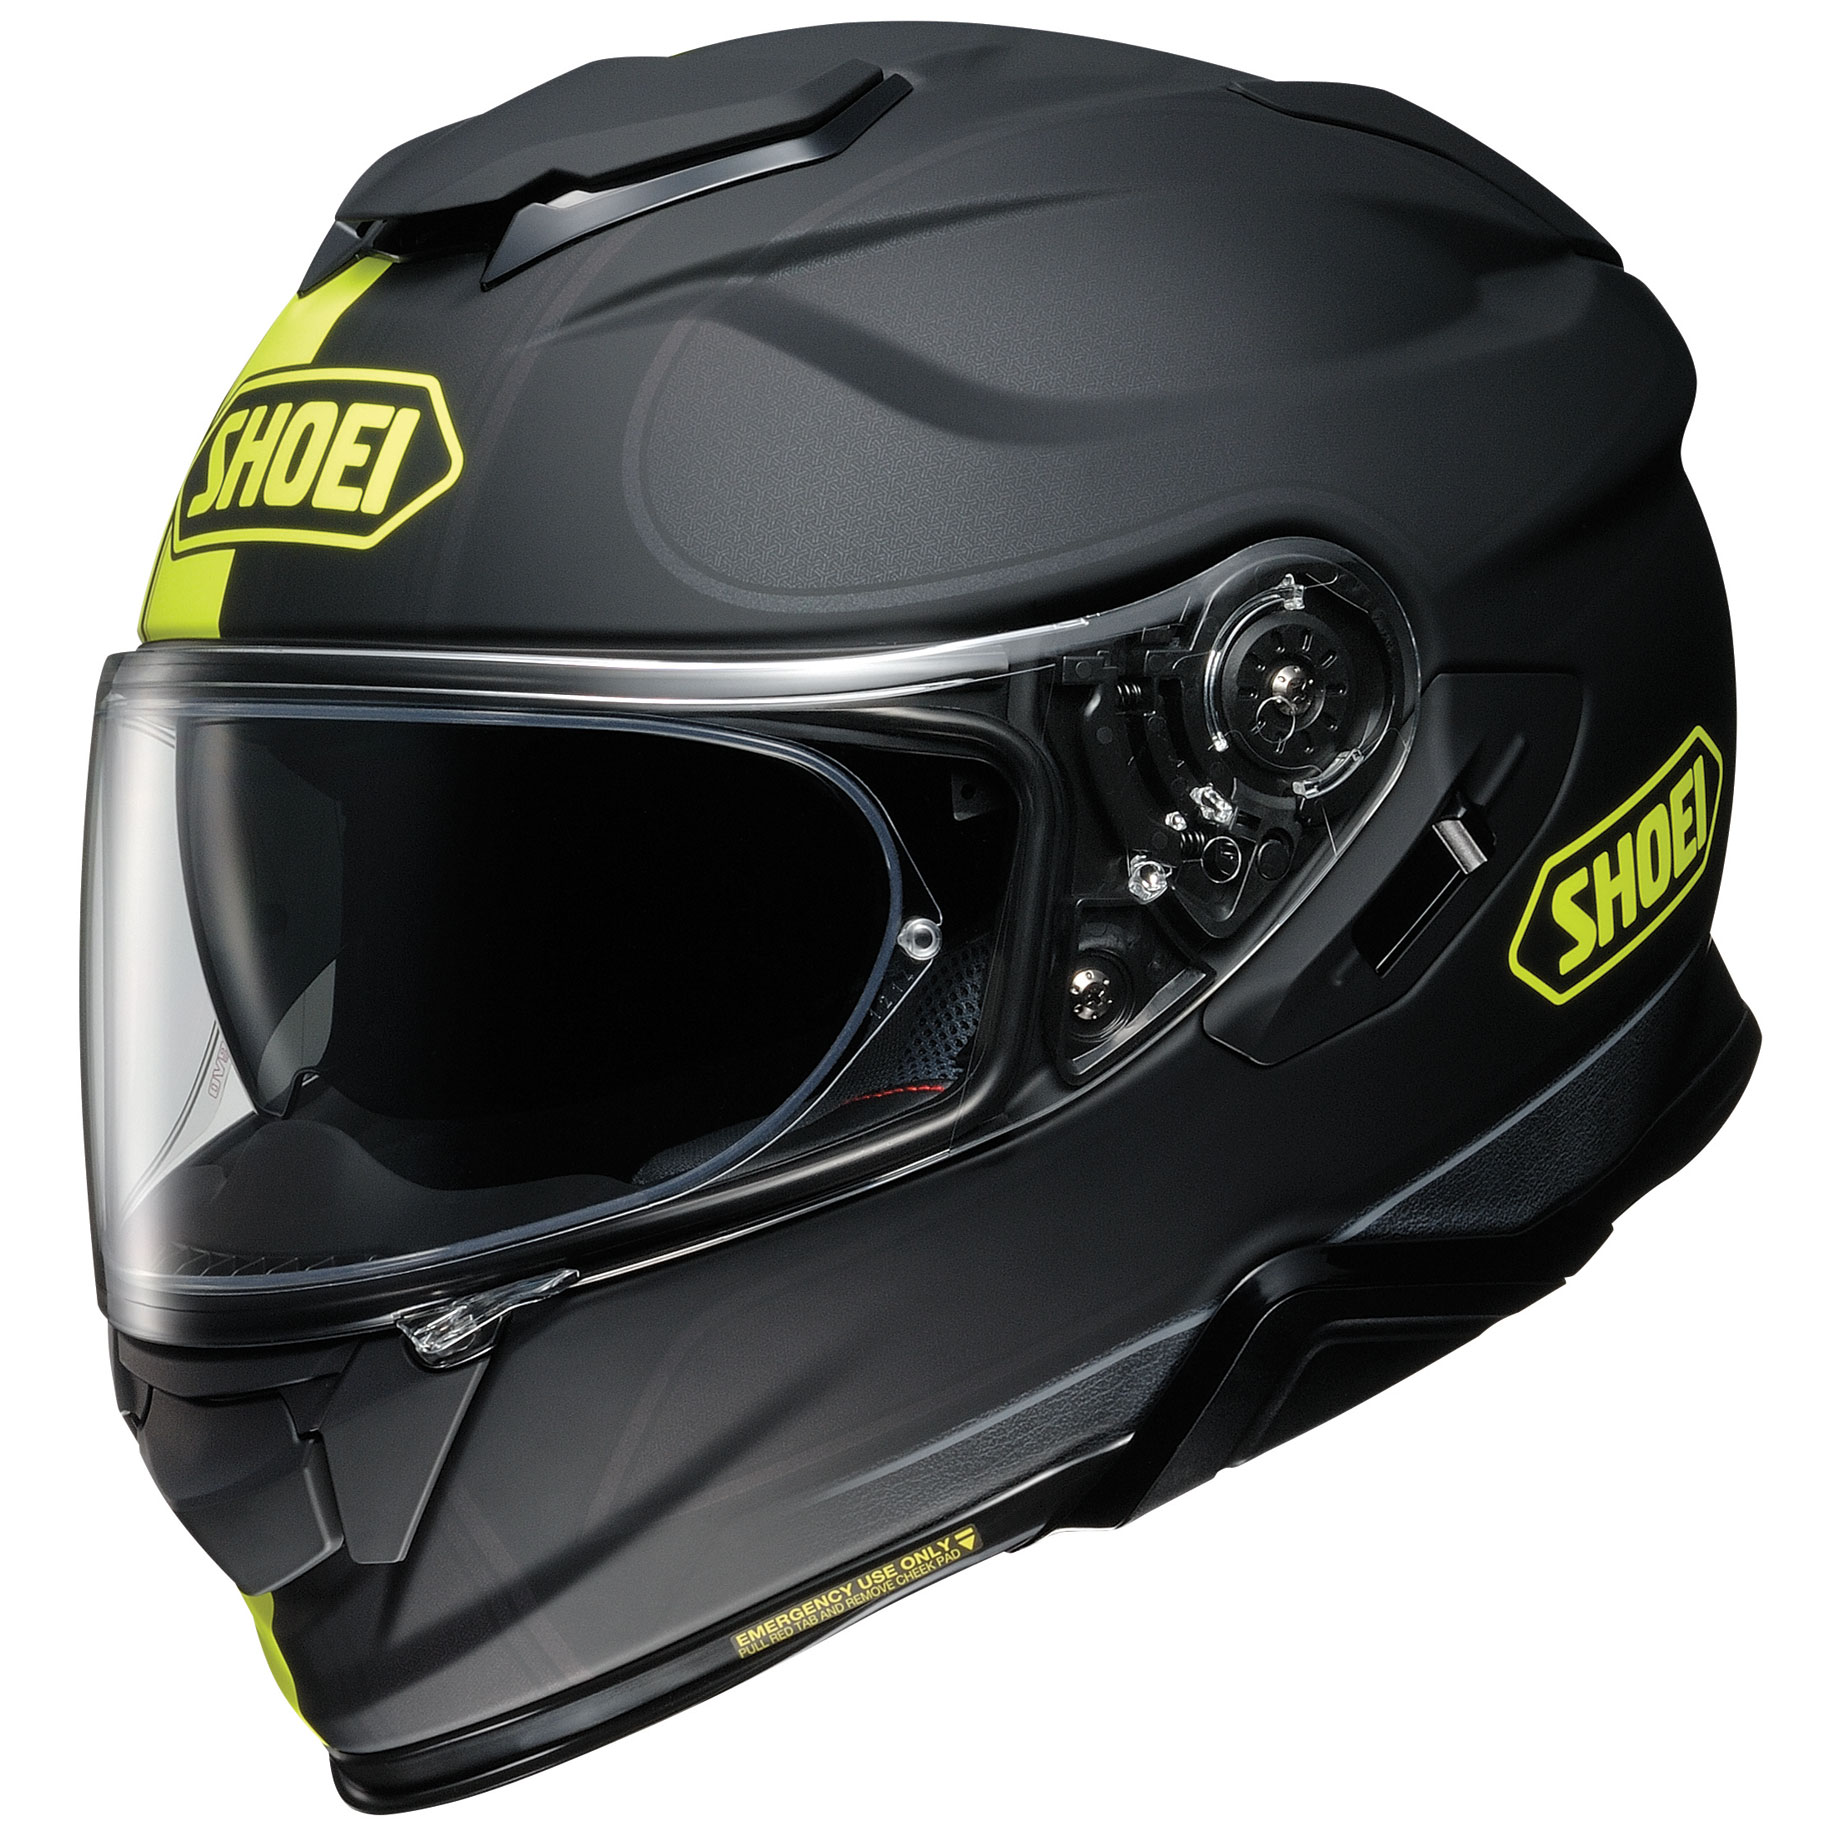 Shoei GT-Air II Redux Matte Yellow/Black Full Face Helmet